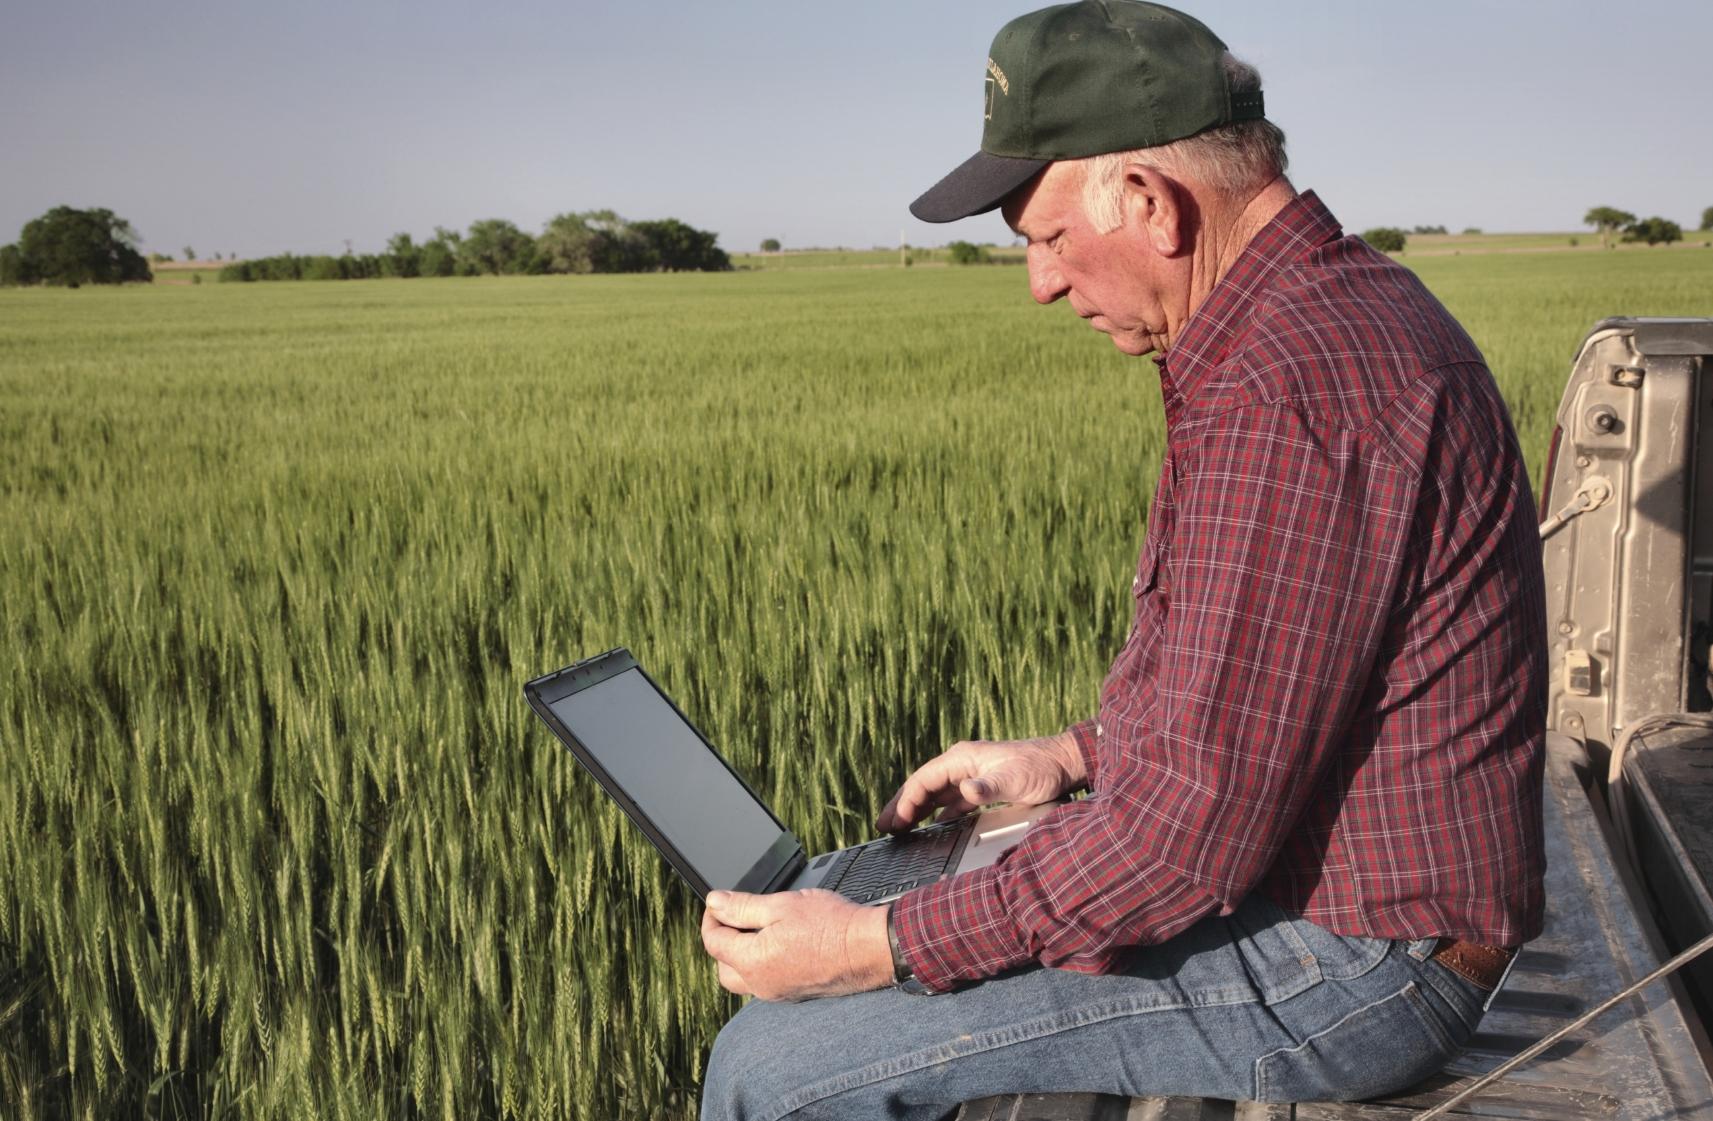 Acquire the agronomics knowledge